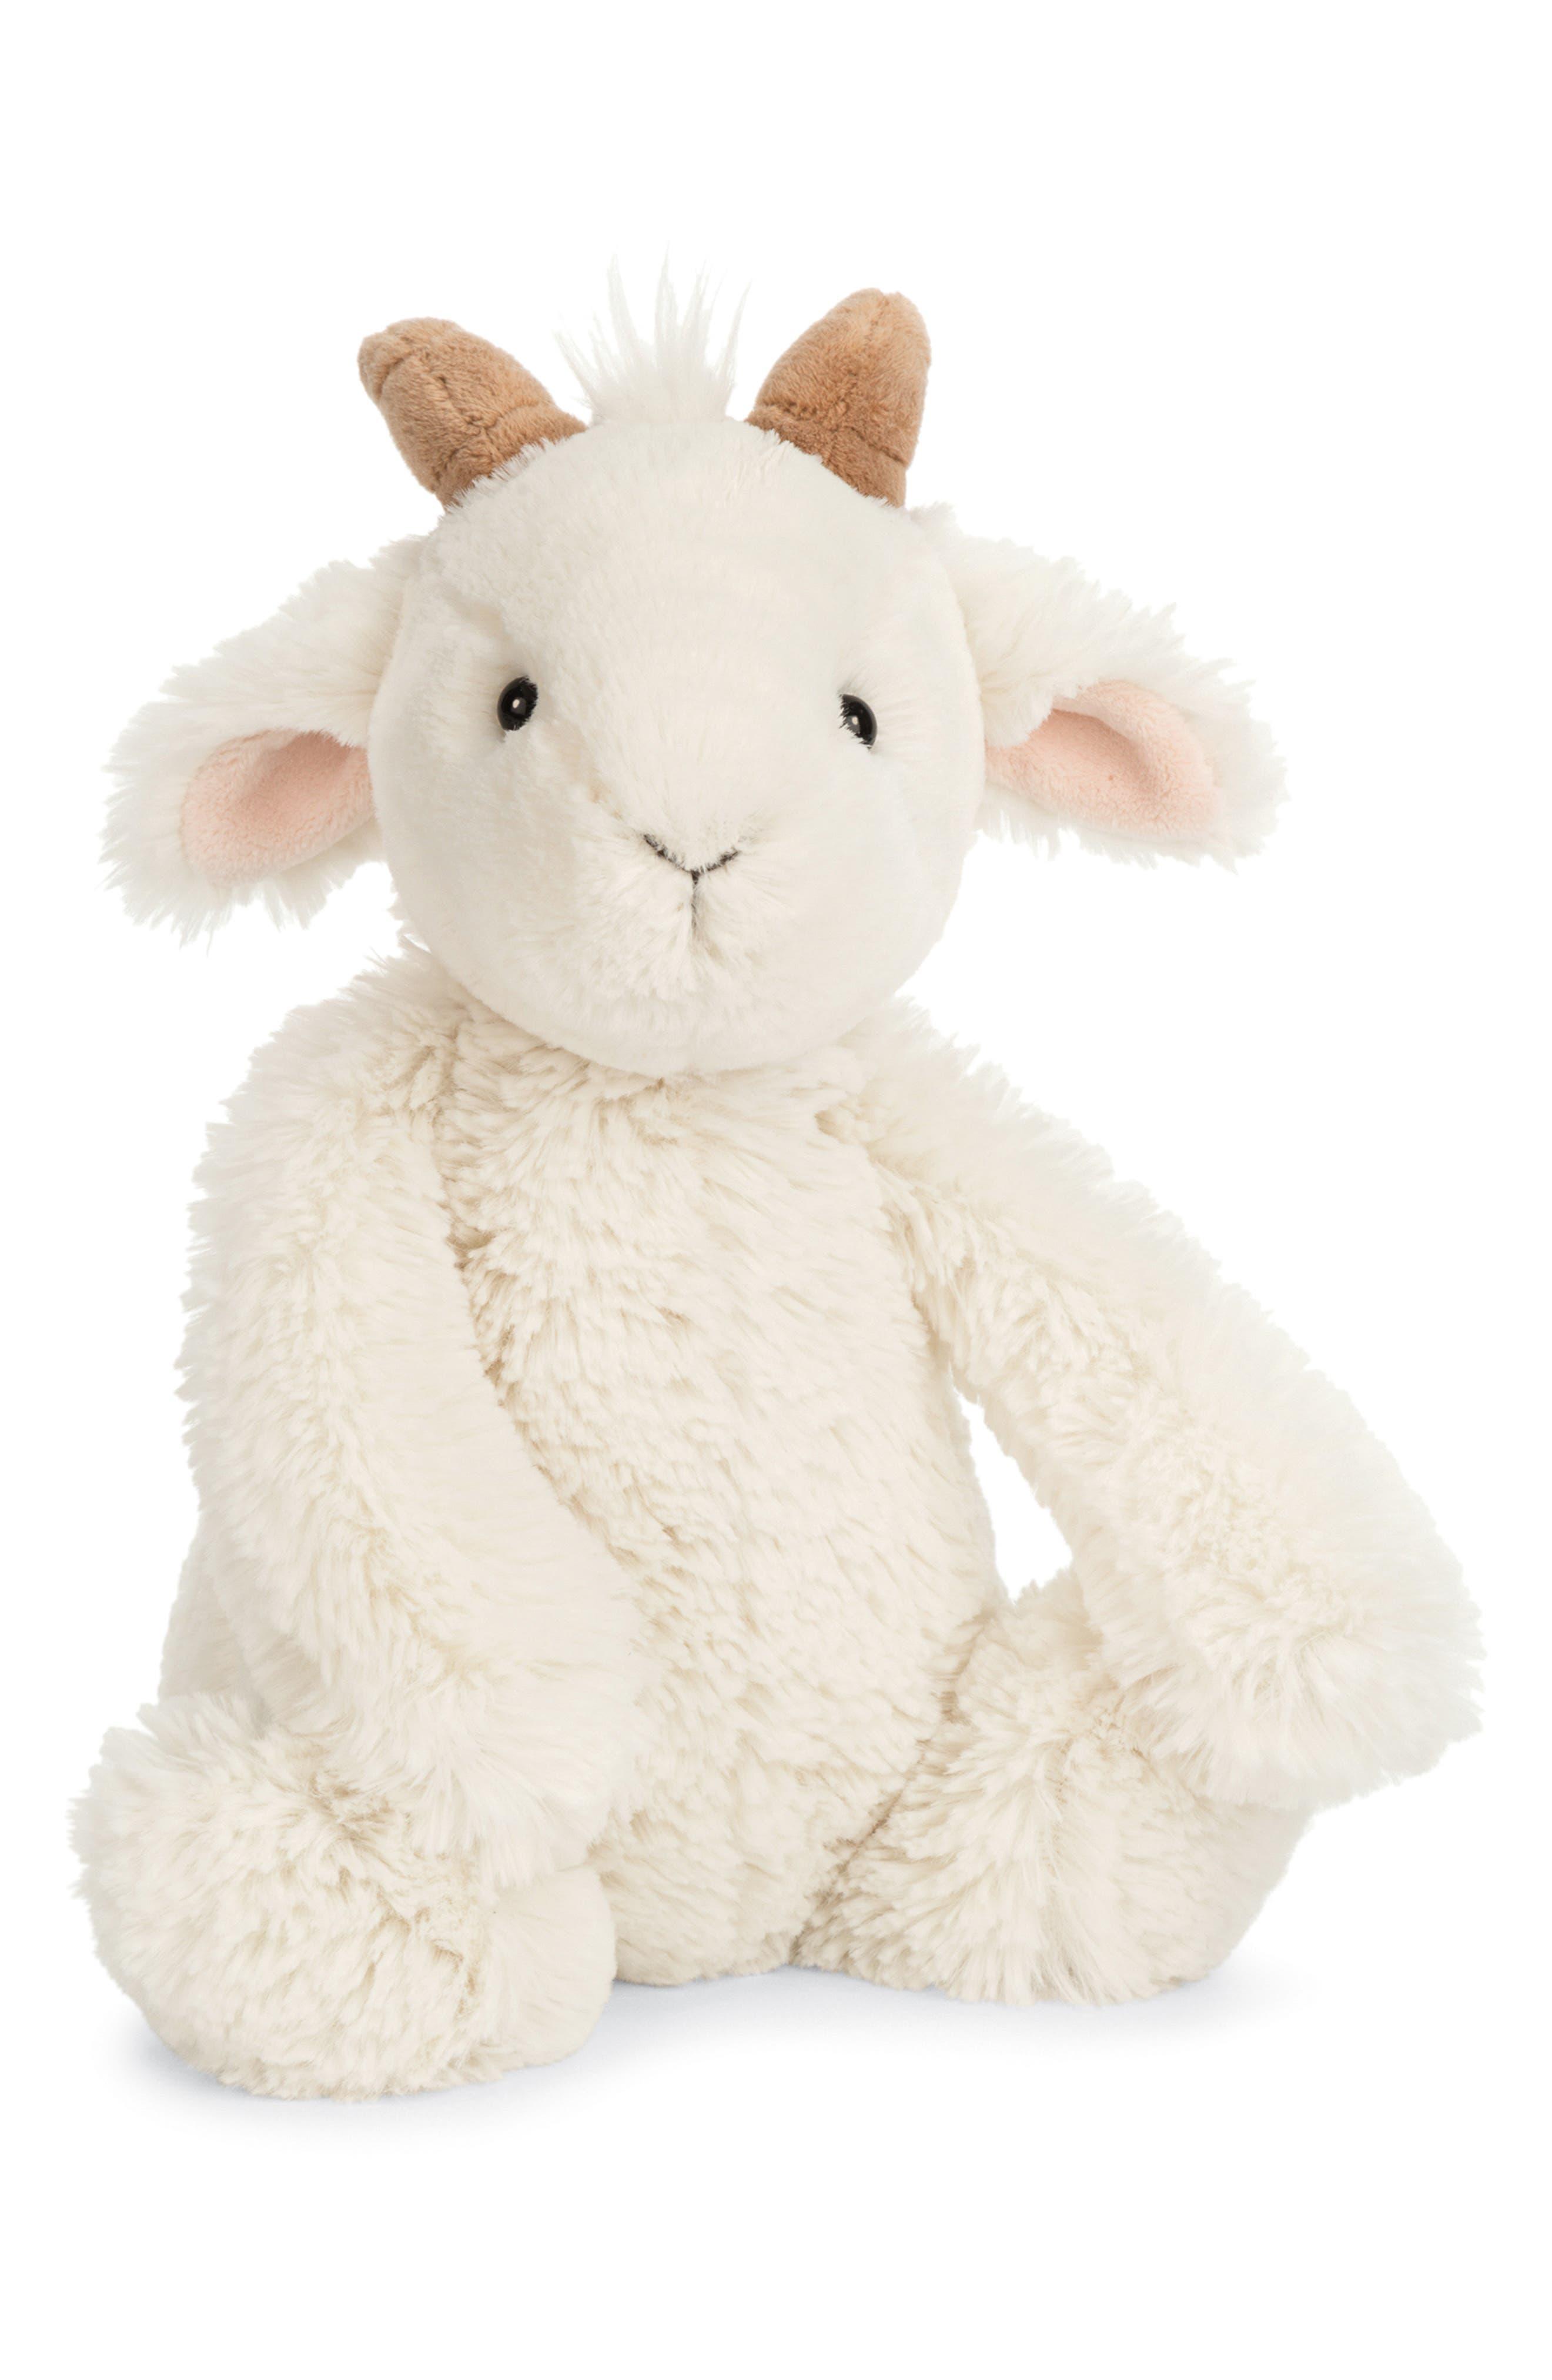 Jellycat Medium Bashful Goat Stuffed Animal Nordstrom